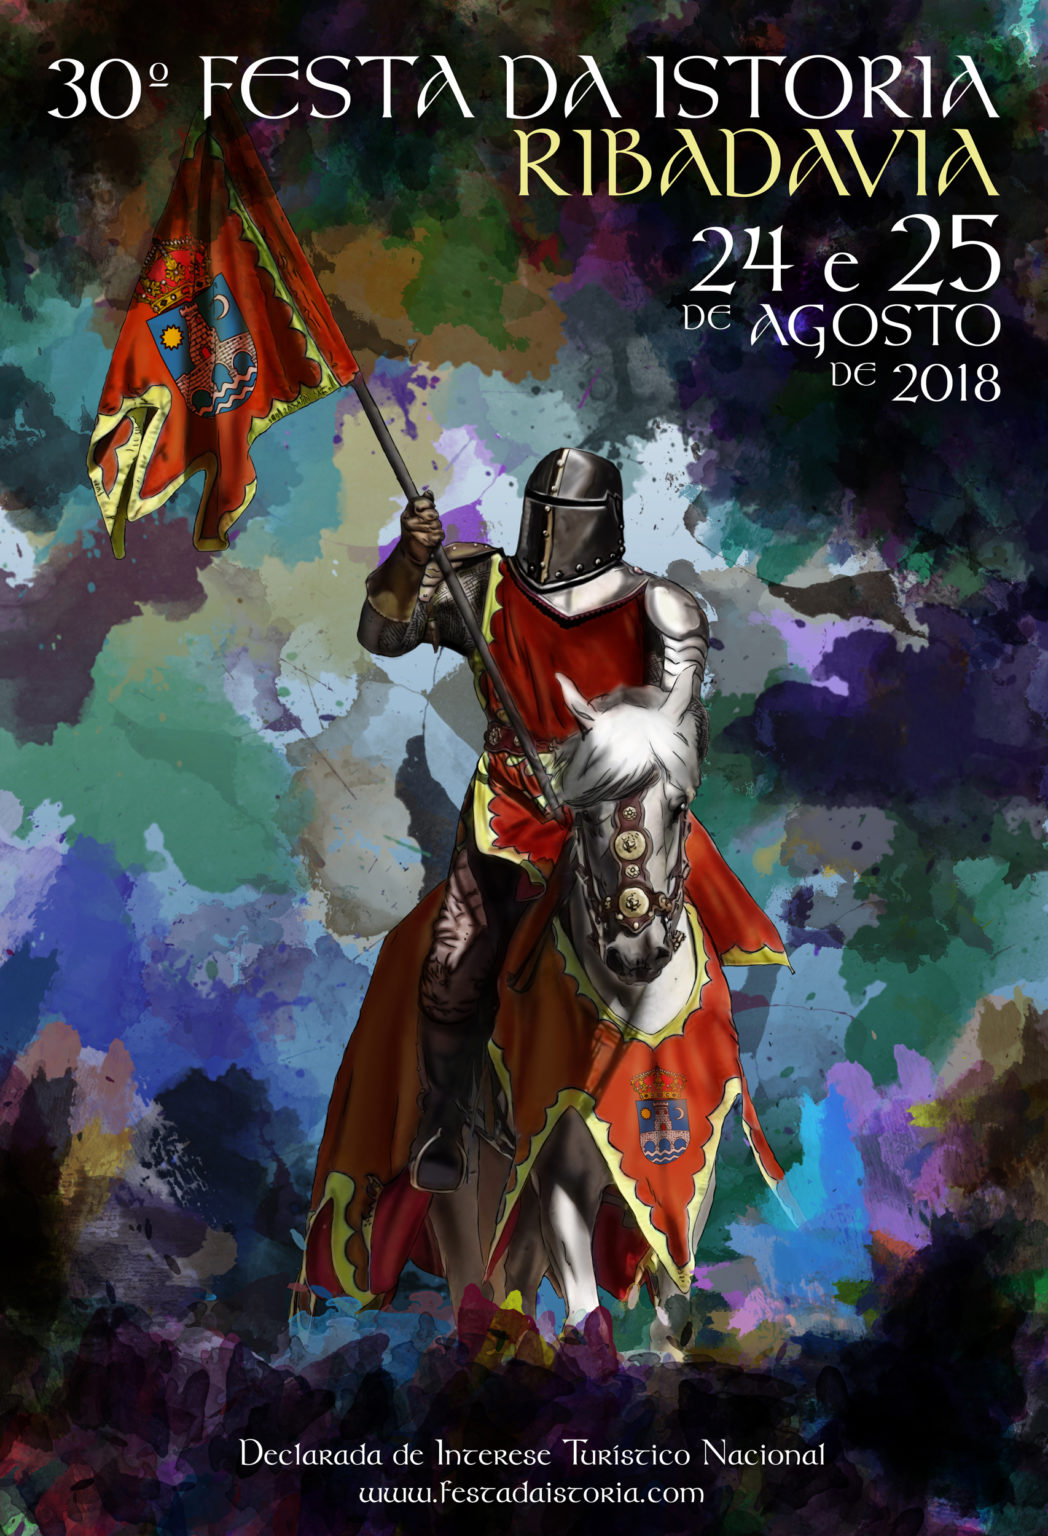 Fiesta da Istoria Ribadavia